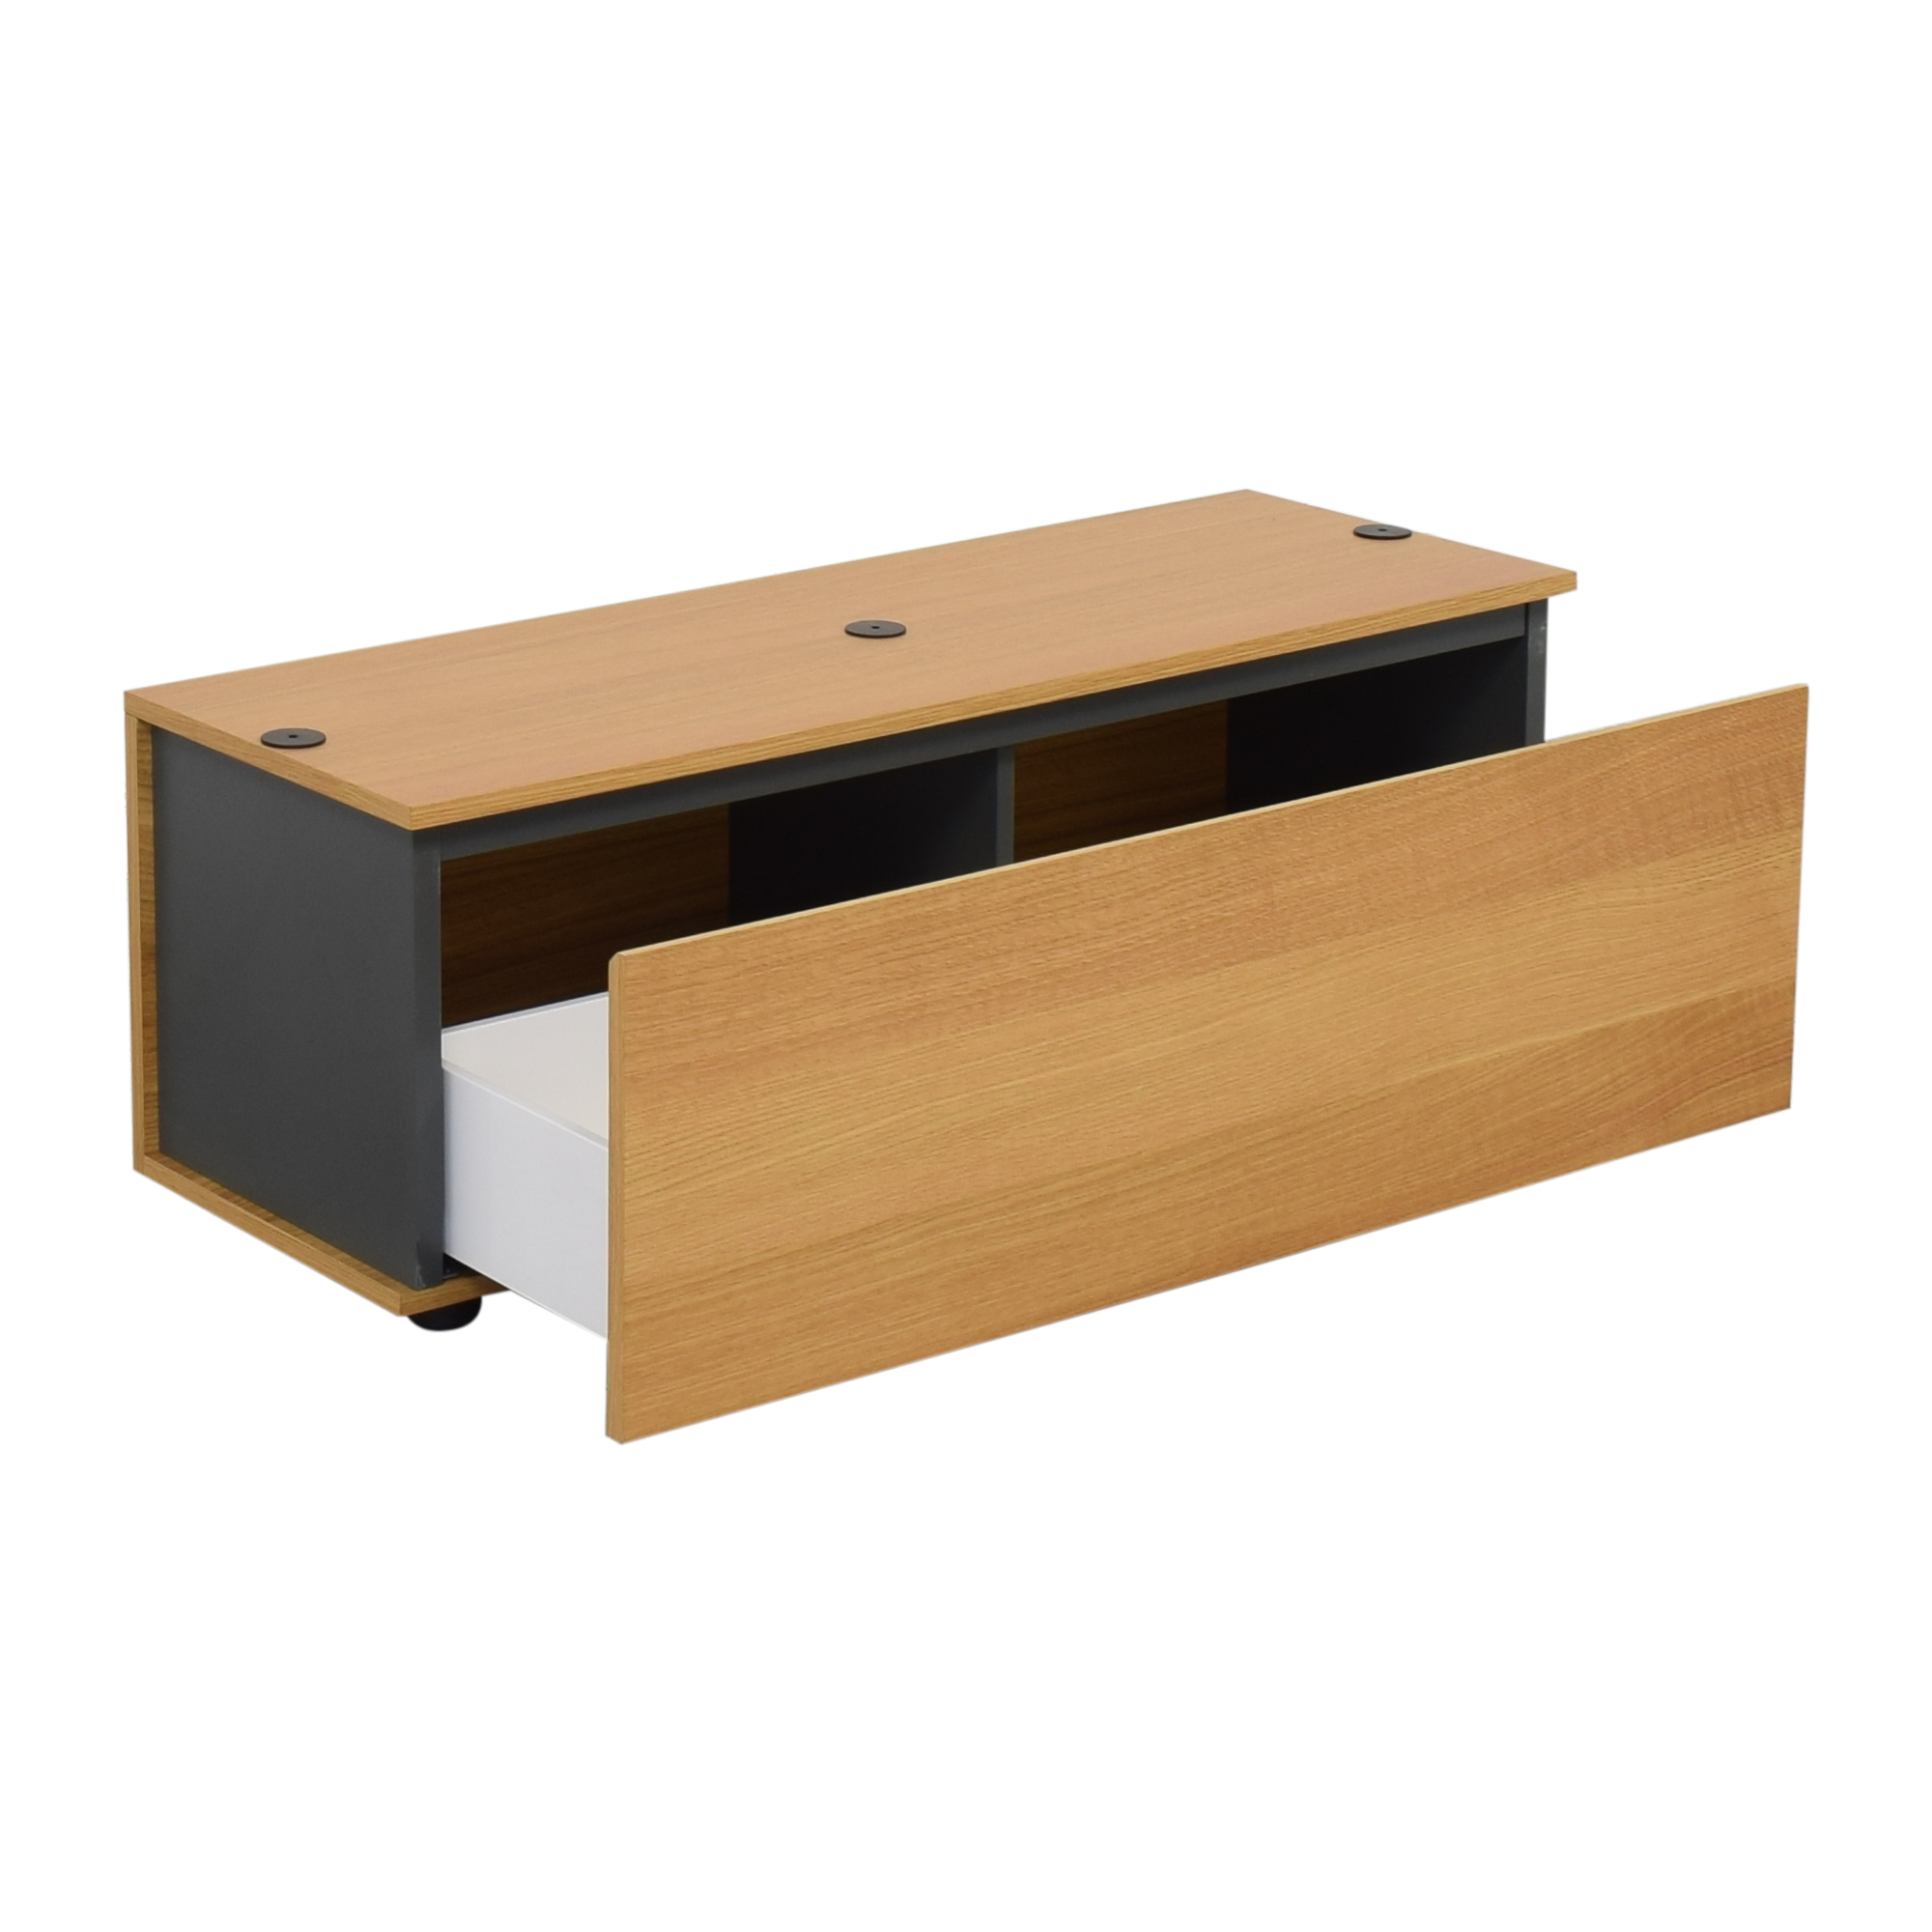 Koleksiyon Koleksiyon Storage Cabinet on sale